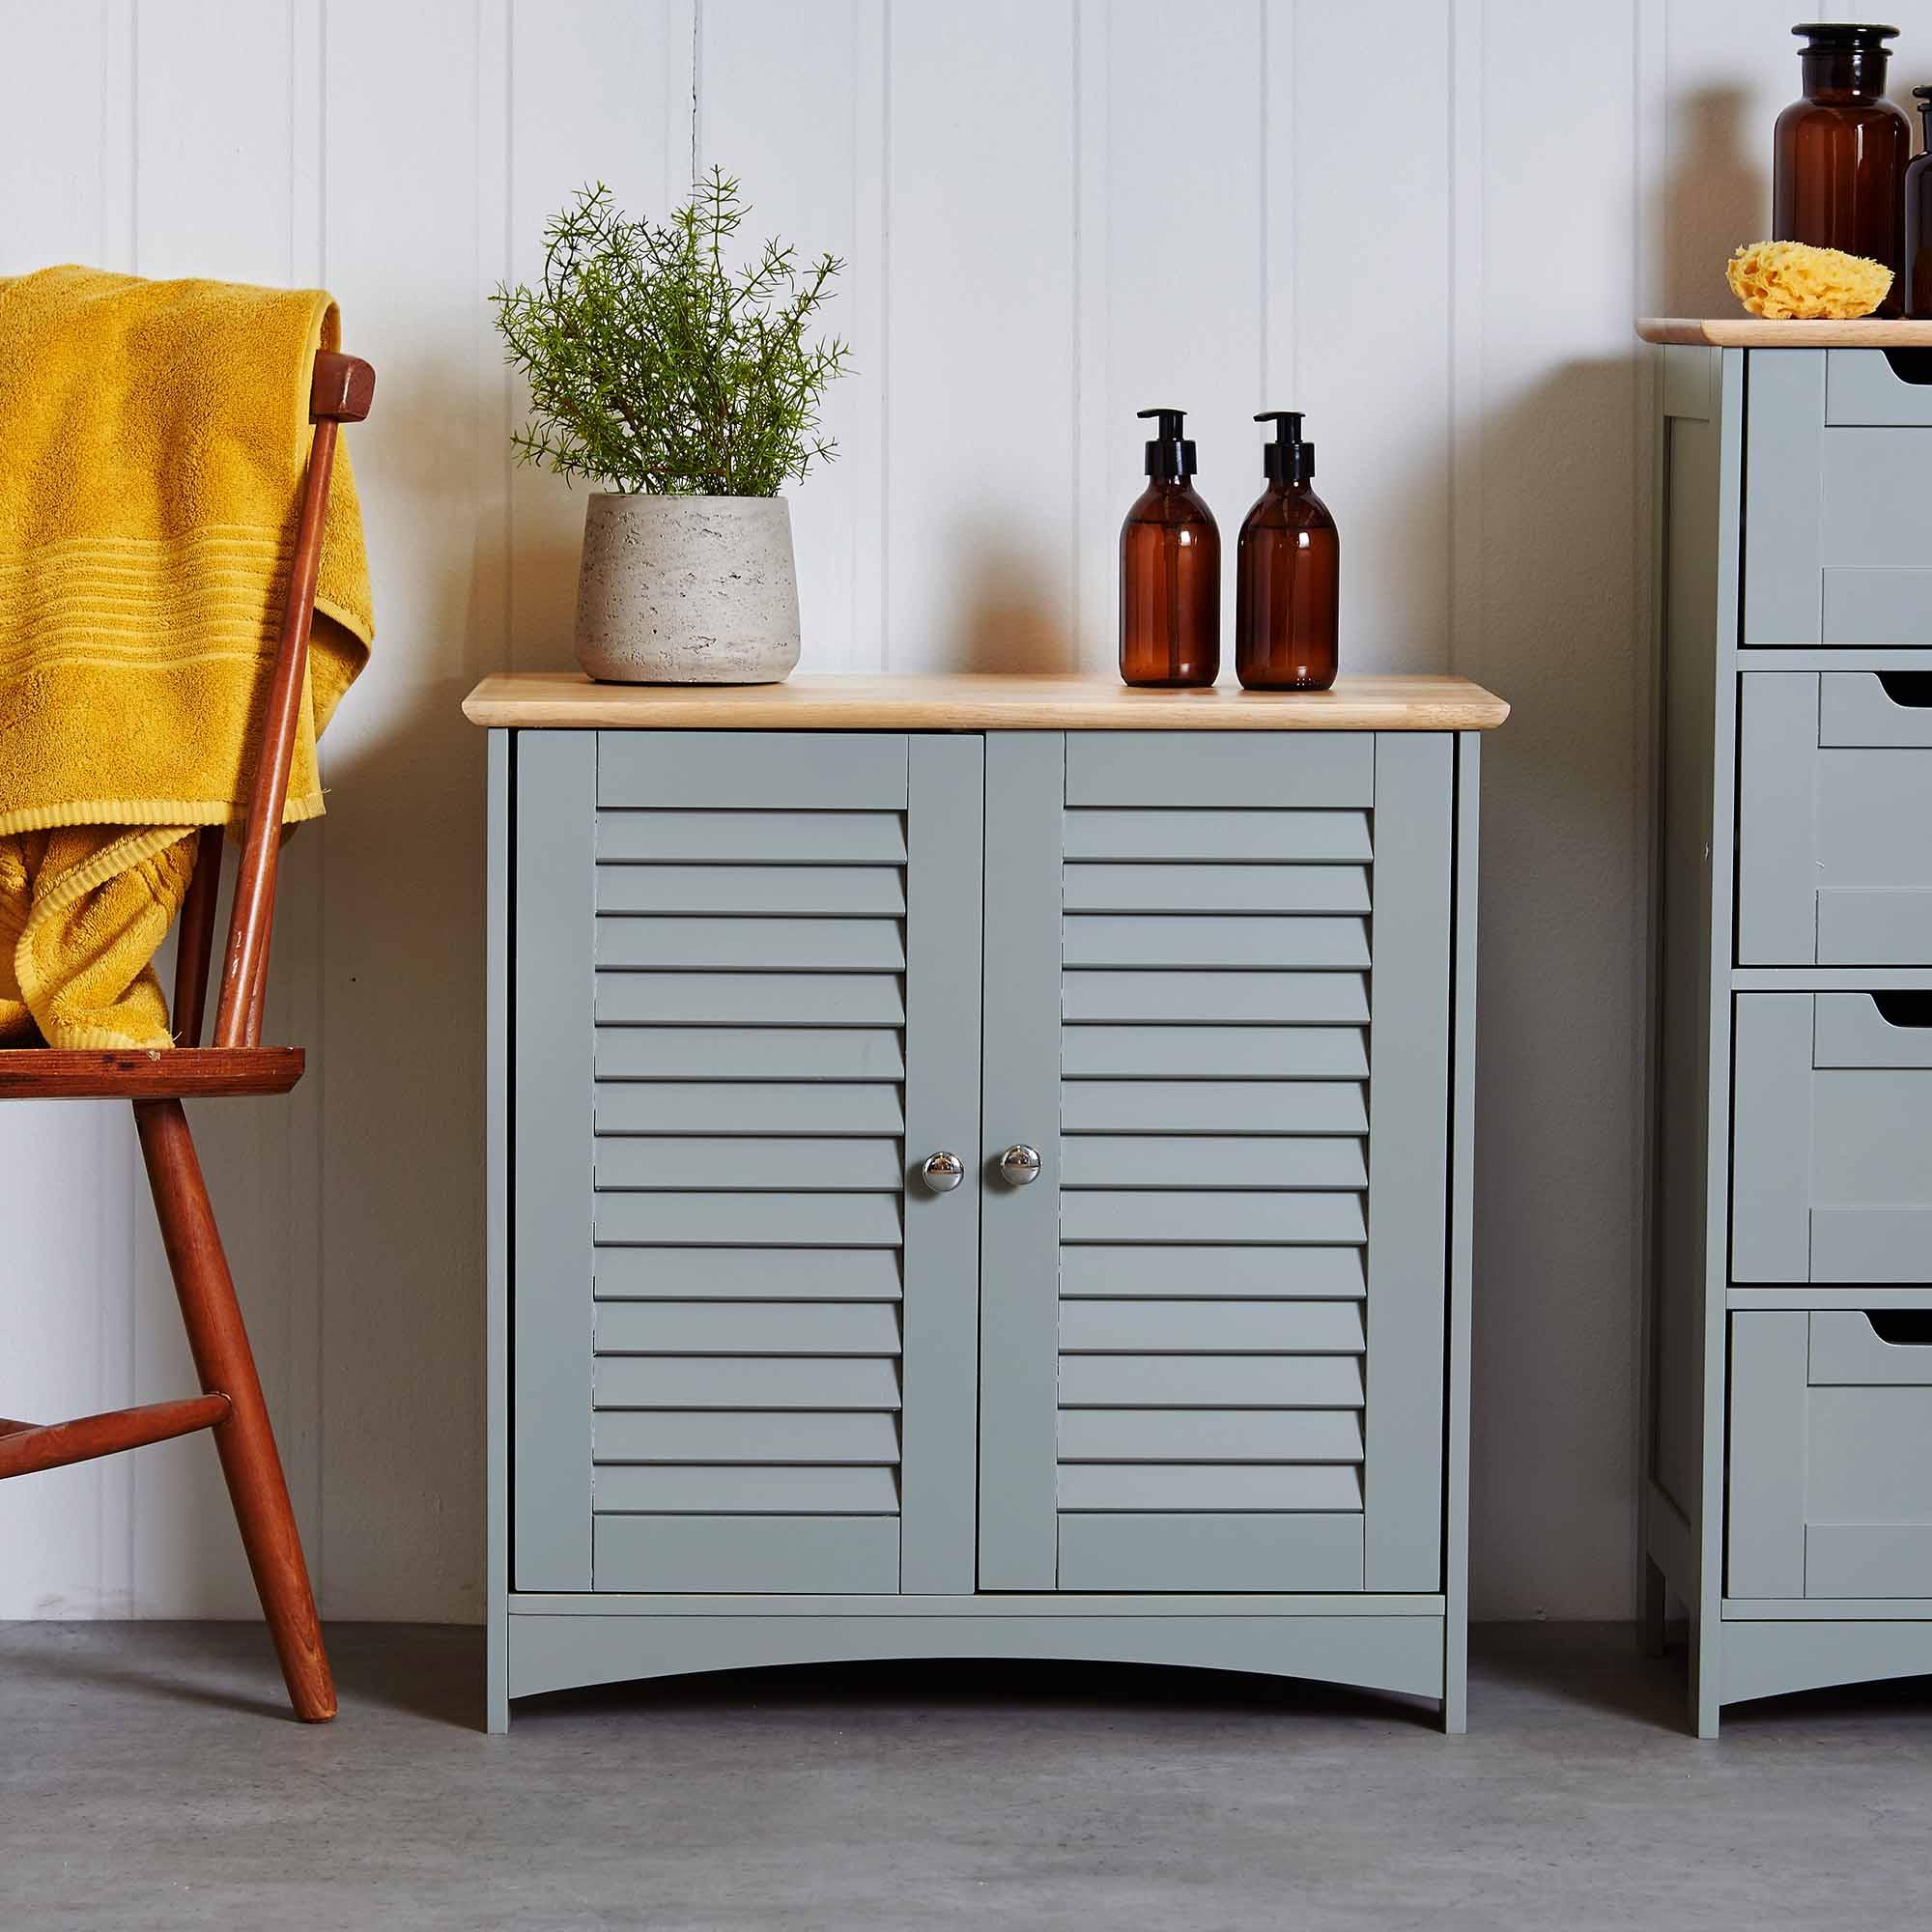 VonHaus Towel Cabinet Floor Standing Unit 2 Shelves and ...